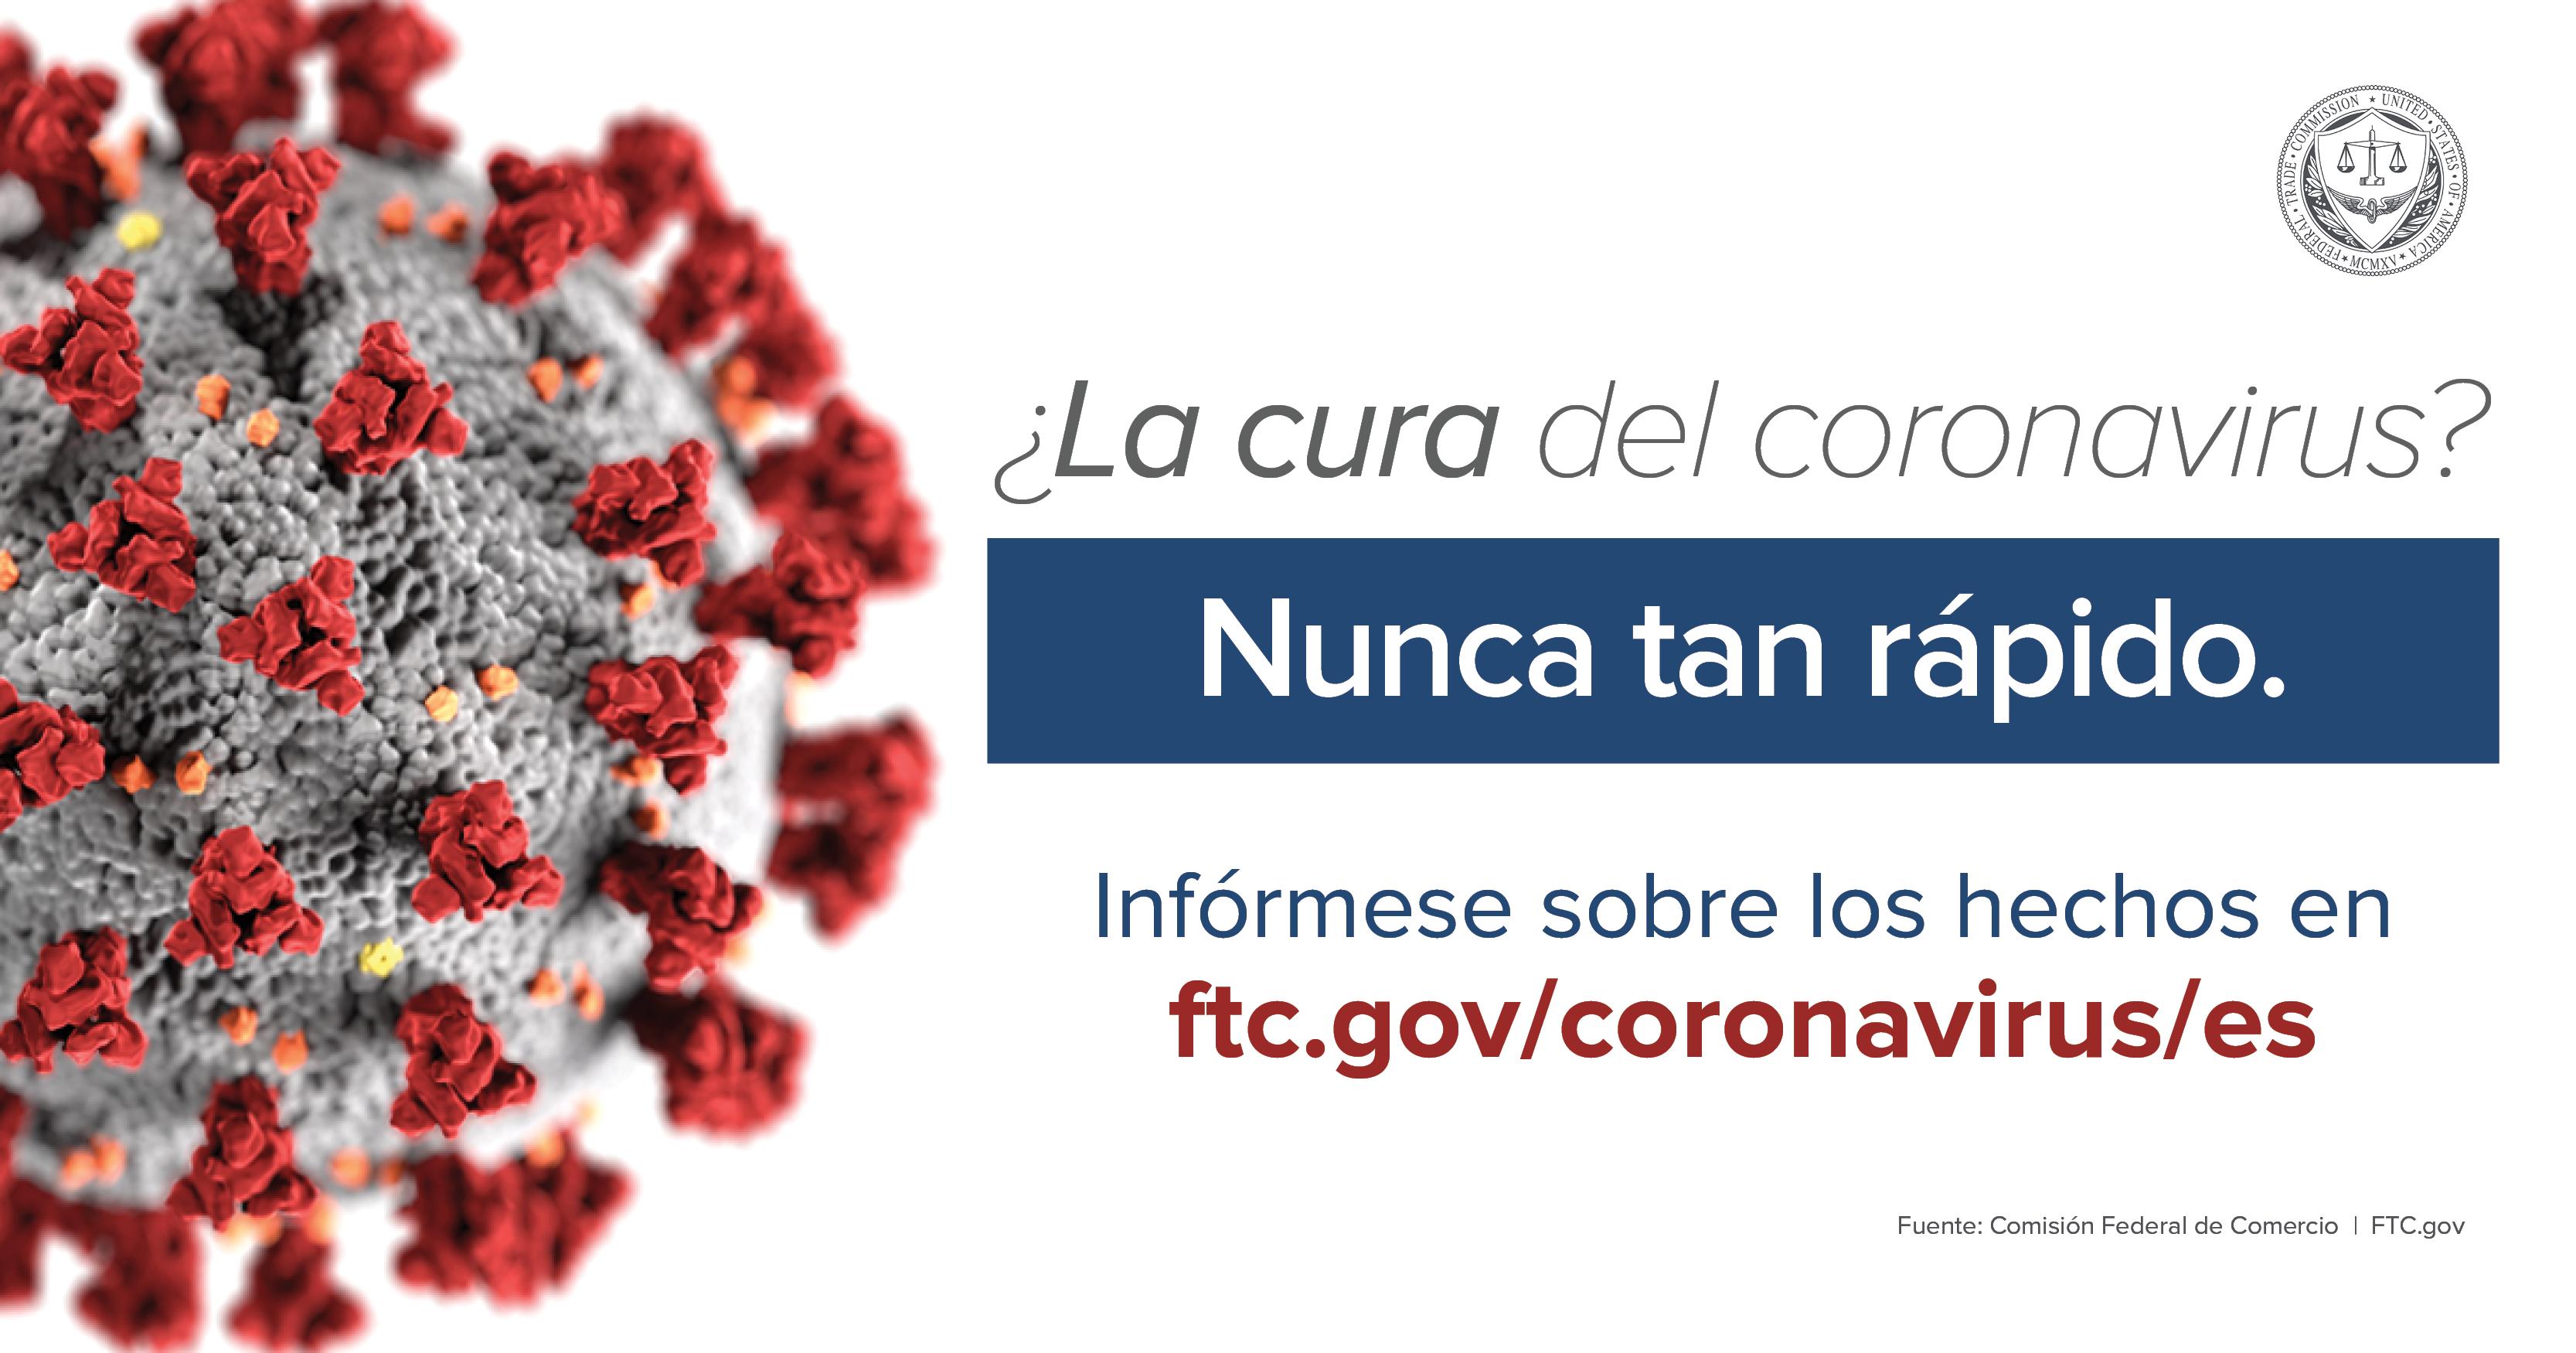 Coronavirus cure? No so fast.